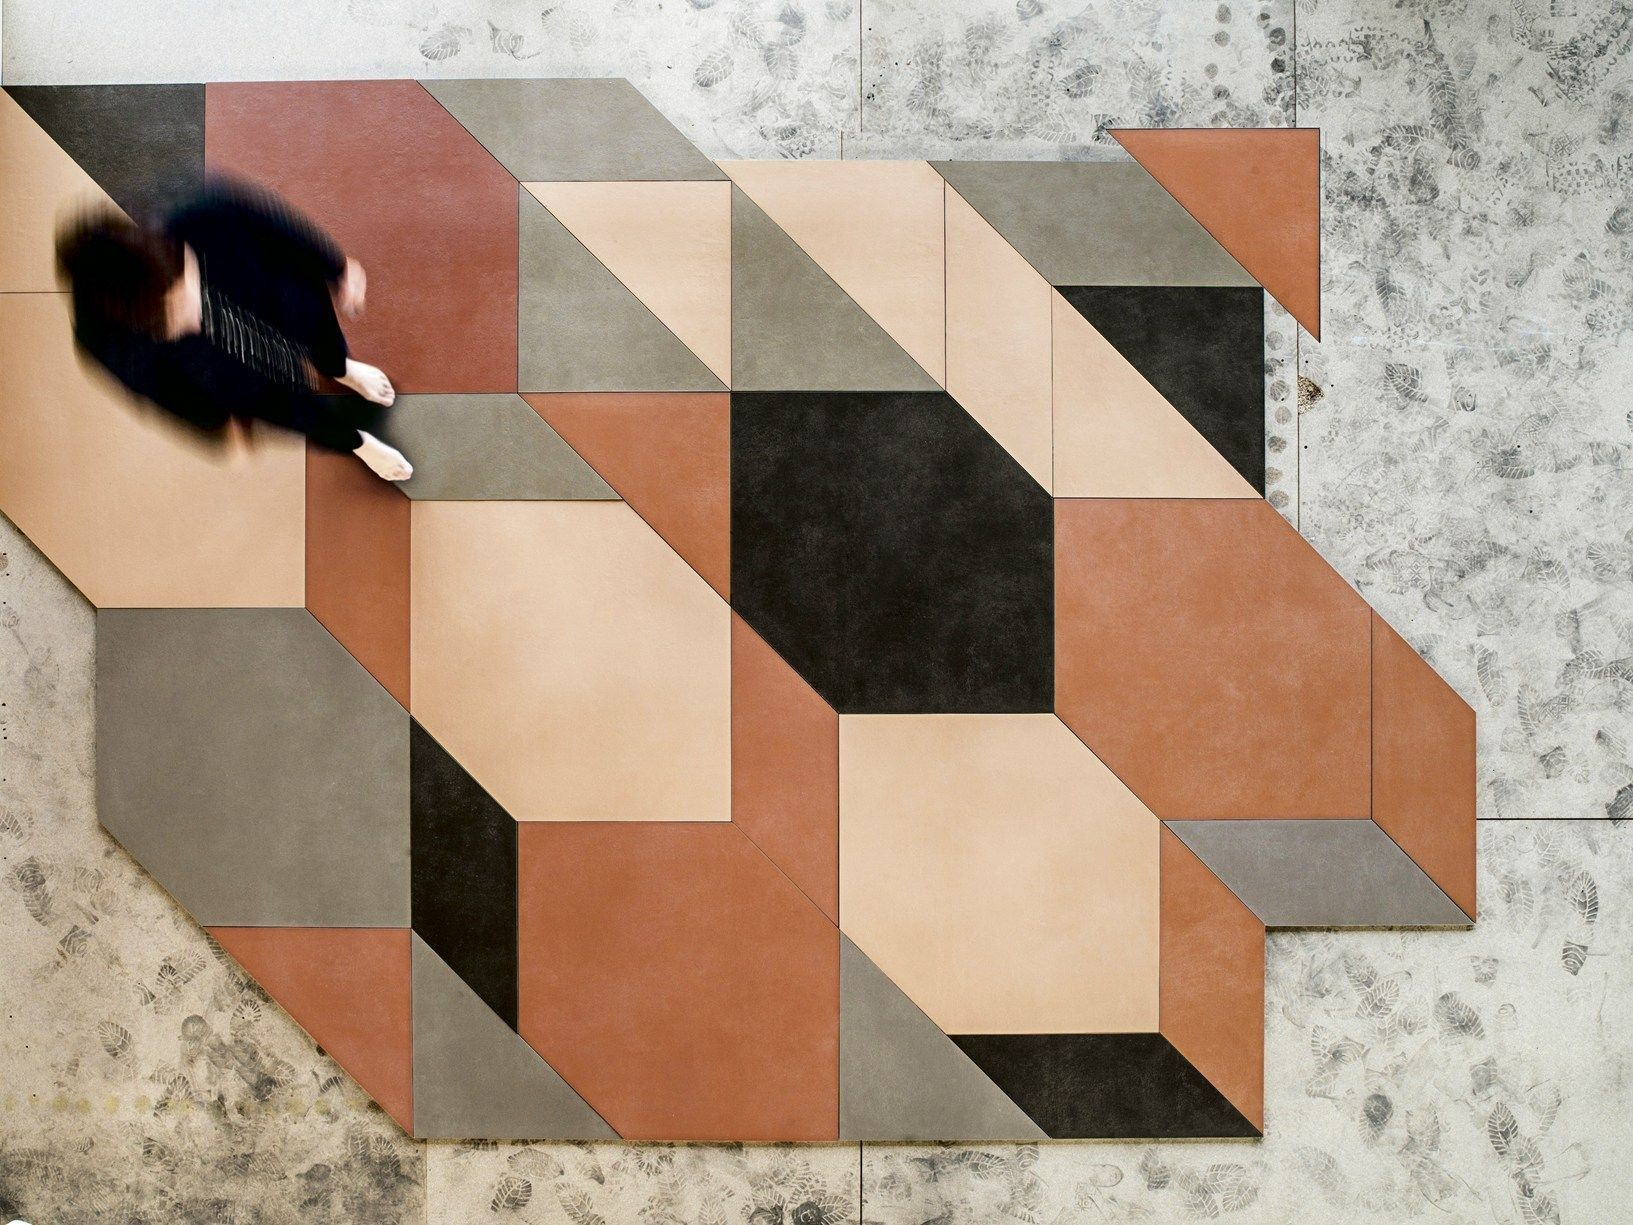 208 best Floor images on Pinterest   Arquitetura, Architecture ...